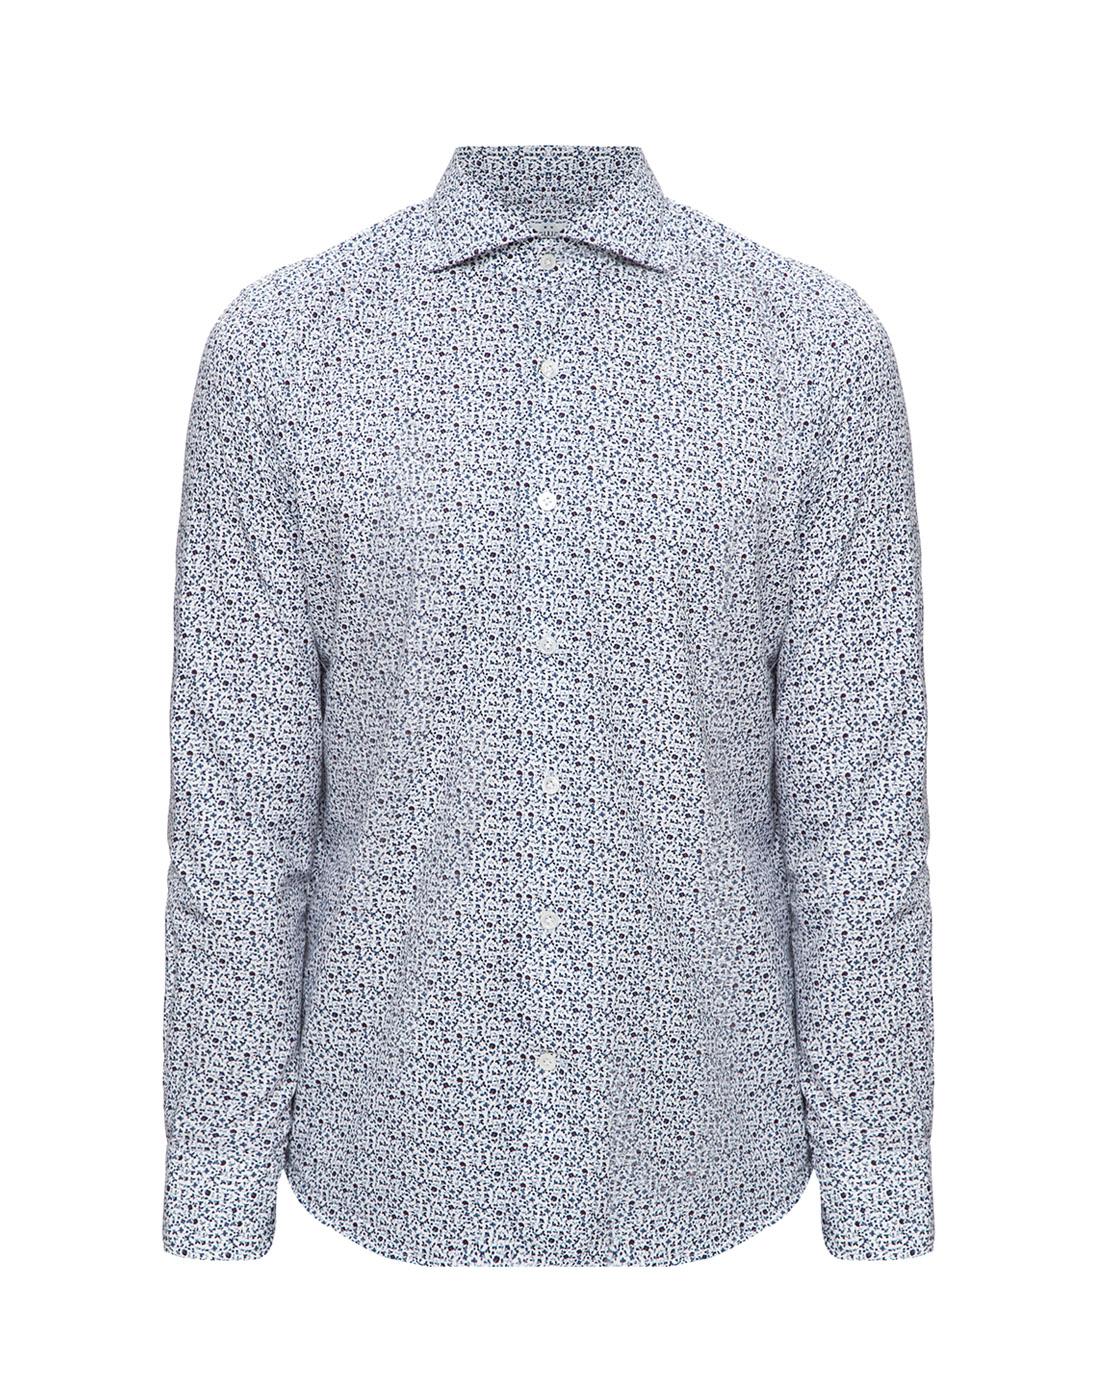 Мужская белая рубашка Bagutta S09511.656-1